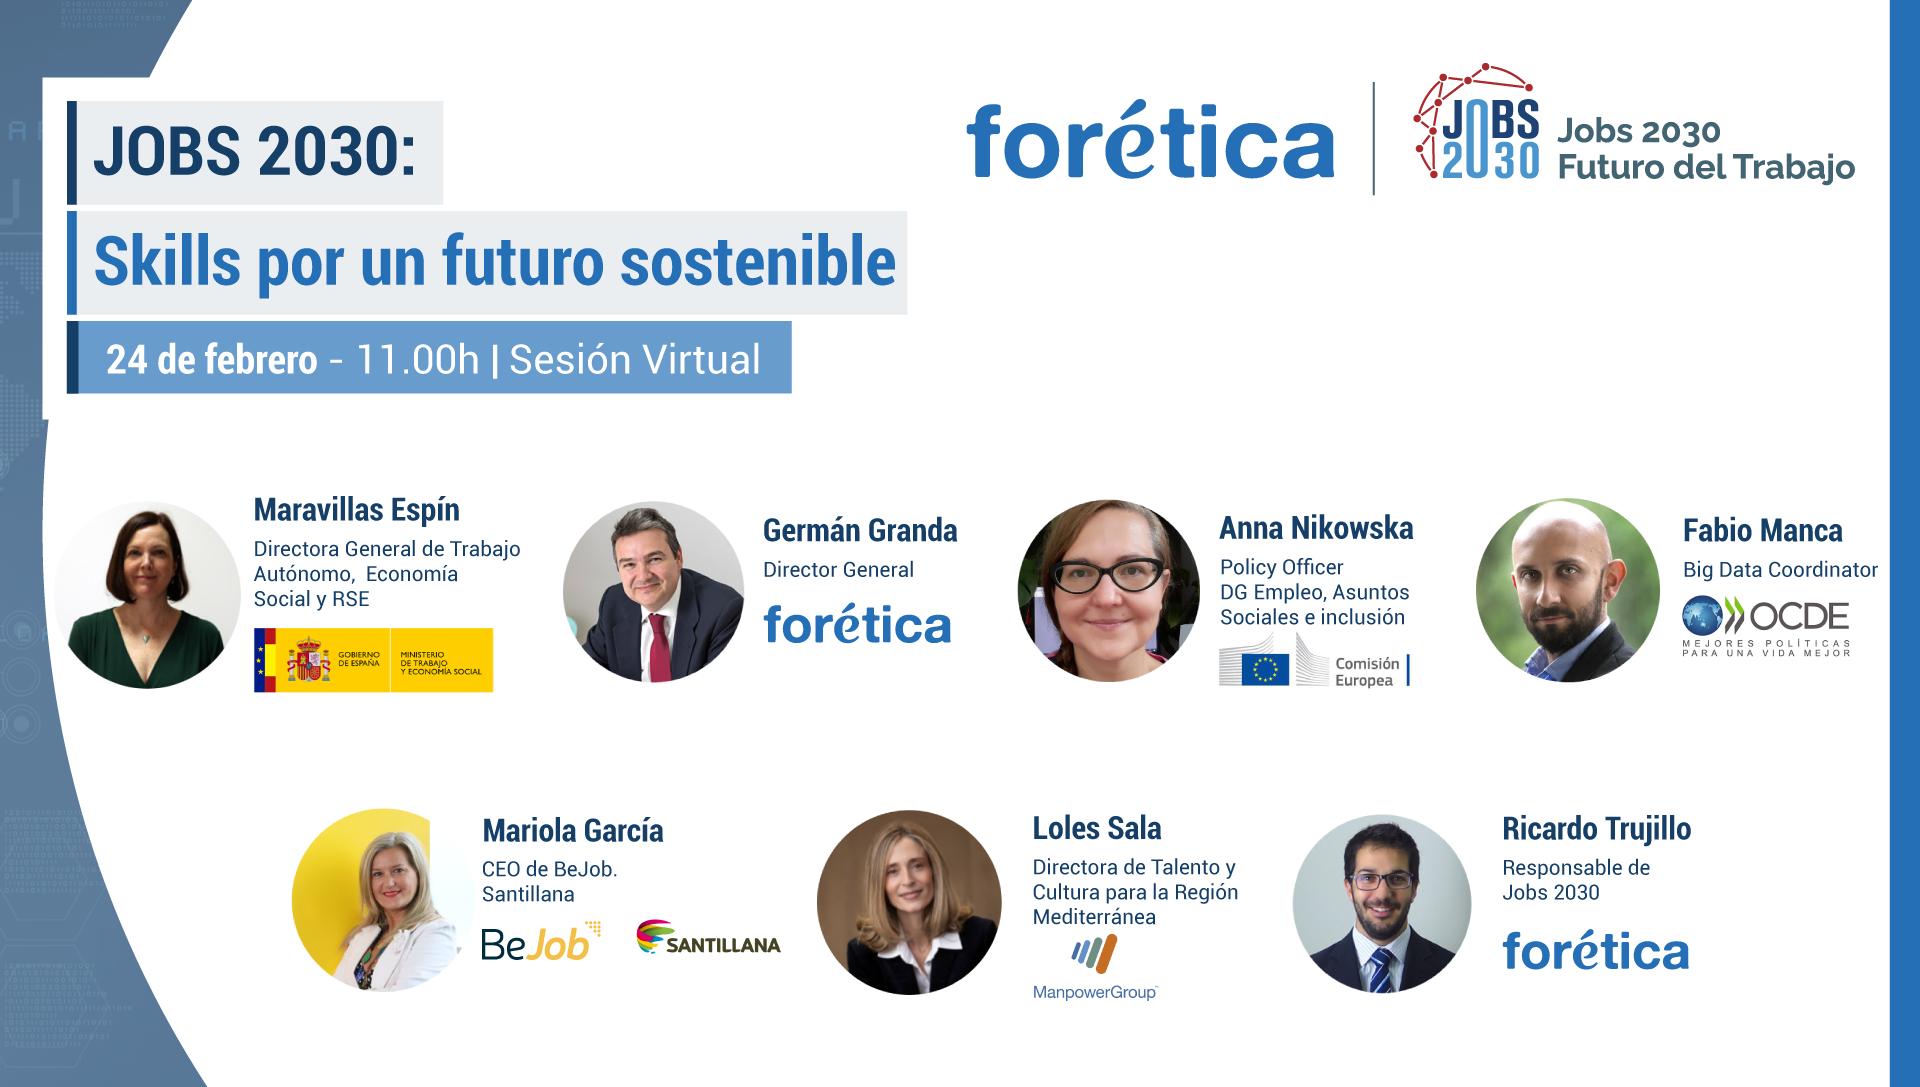 JOBS 2030: Skills por un futuro sostenible